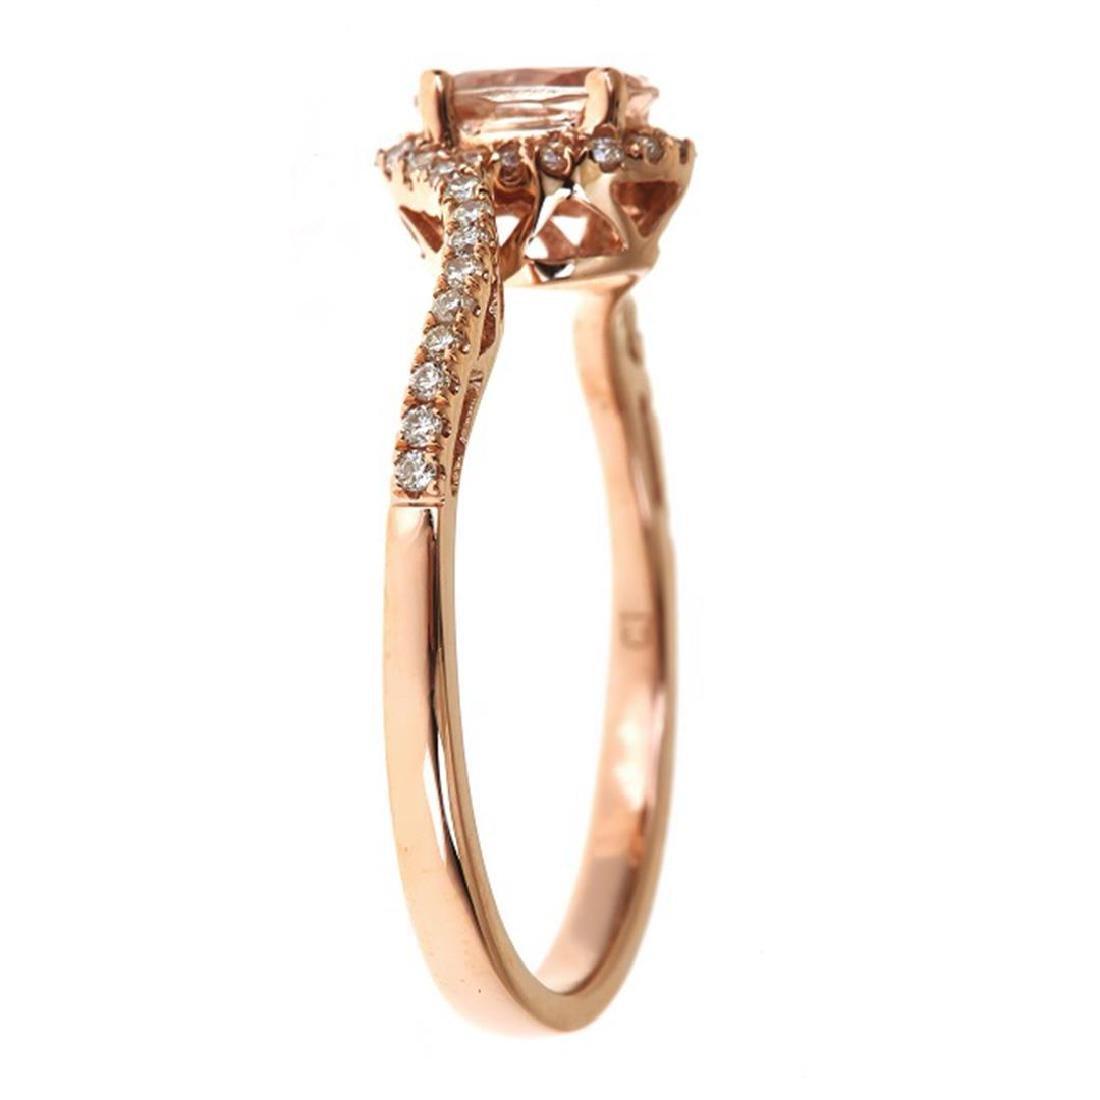 0.48 ctw Morganite and Diamond Ring - 14KT Rose Gold - 2